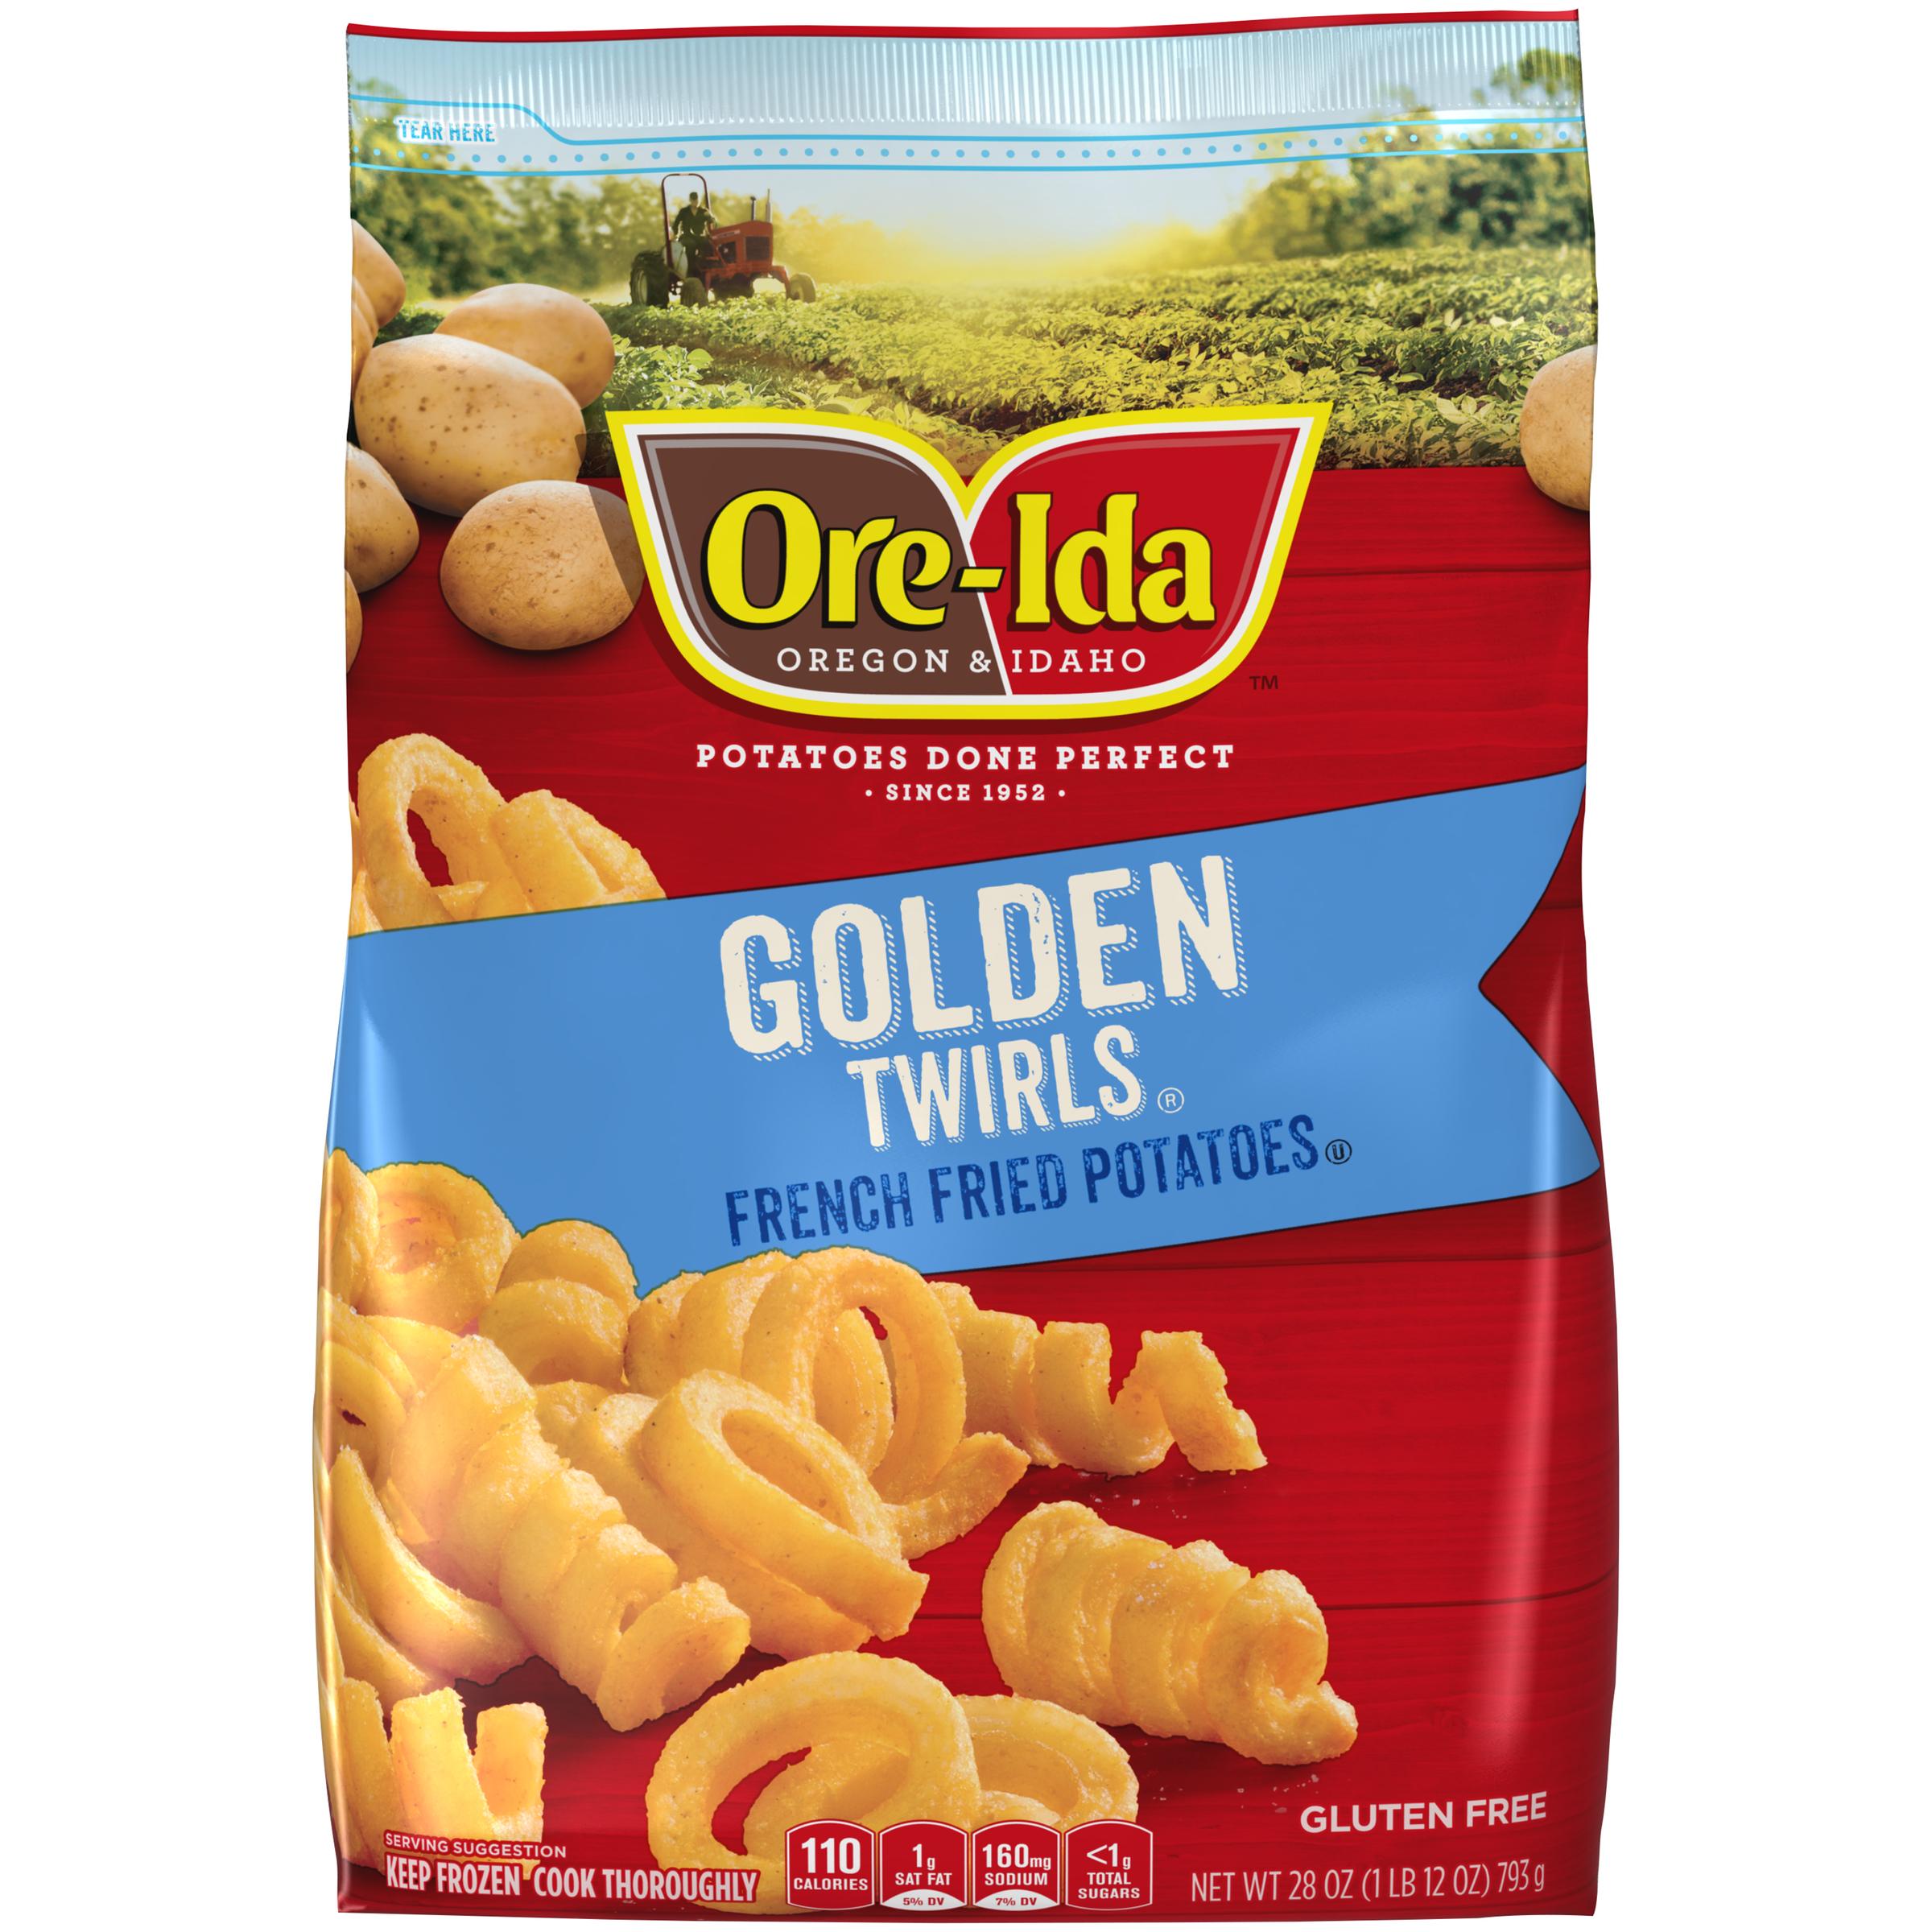 Ore-Ida Golden Twirls French Fried Potatoes